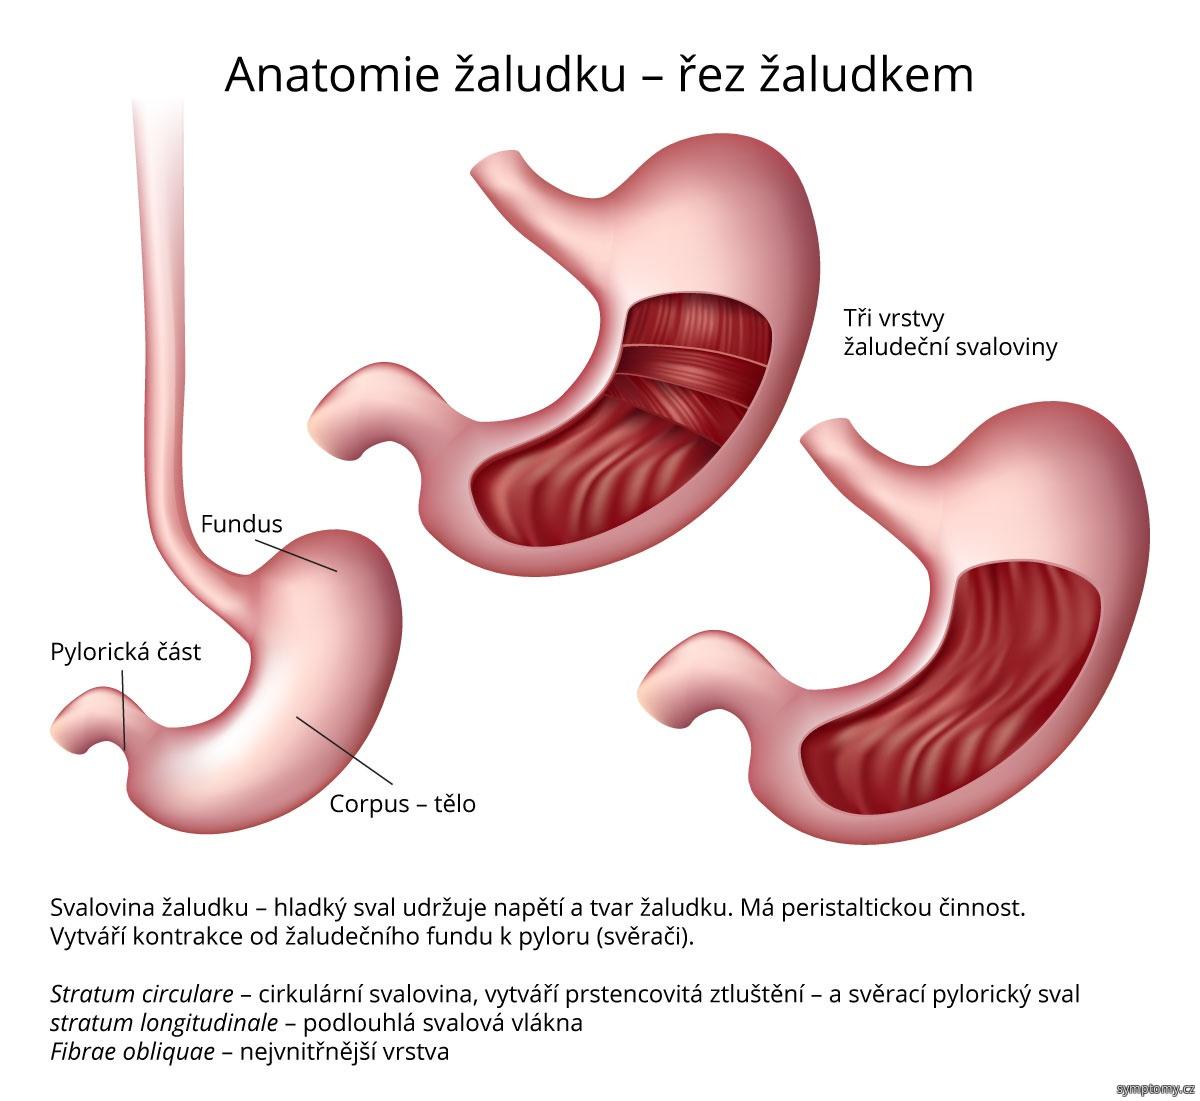 Anatomie žaludku, řez žaludkem